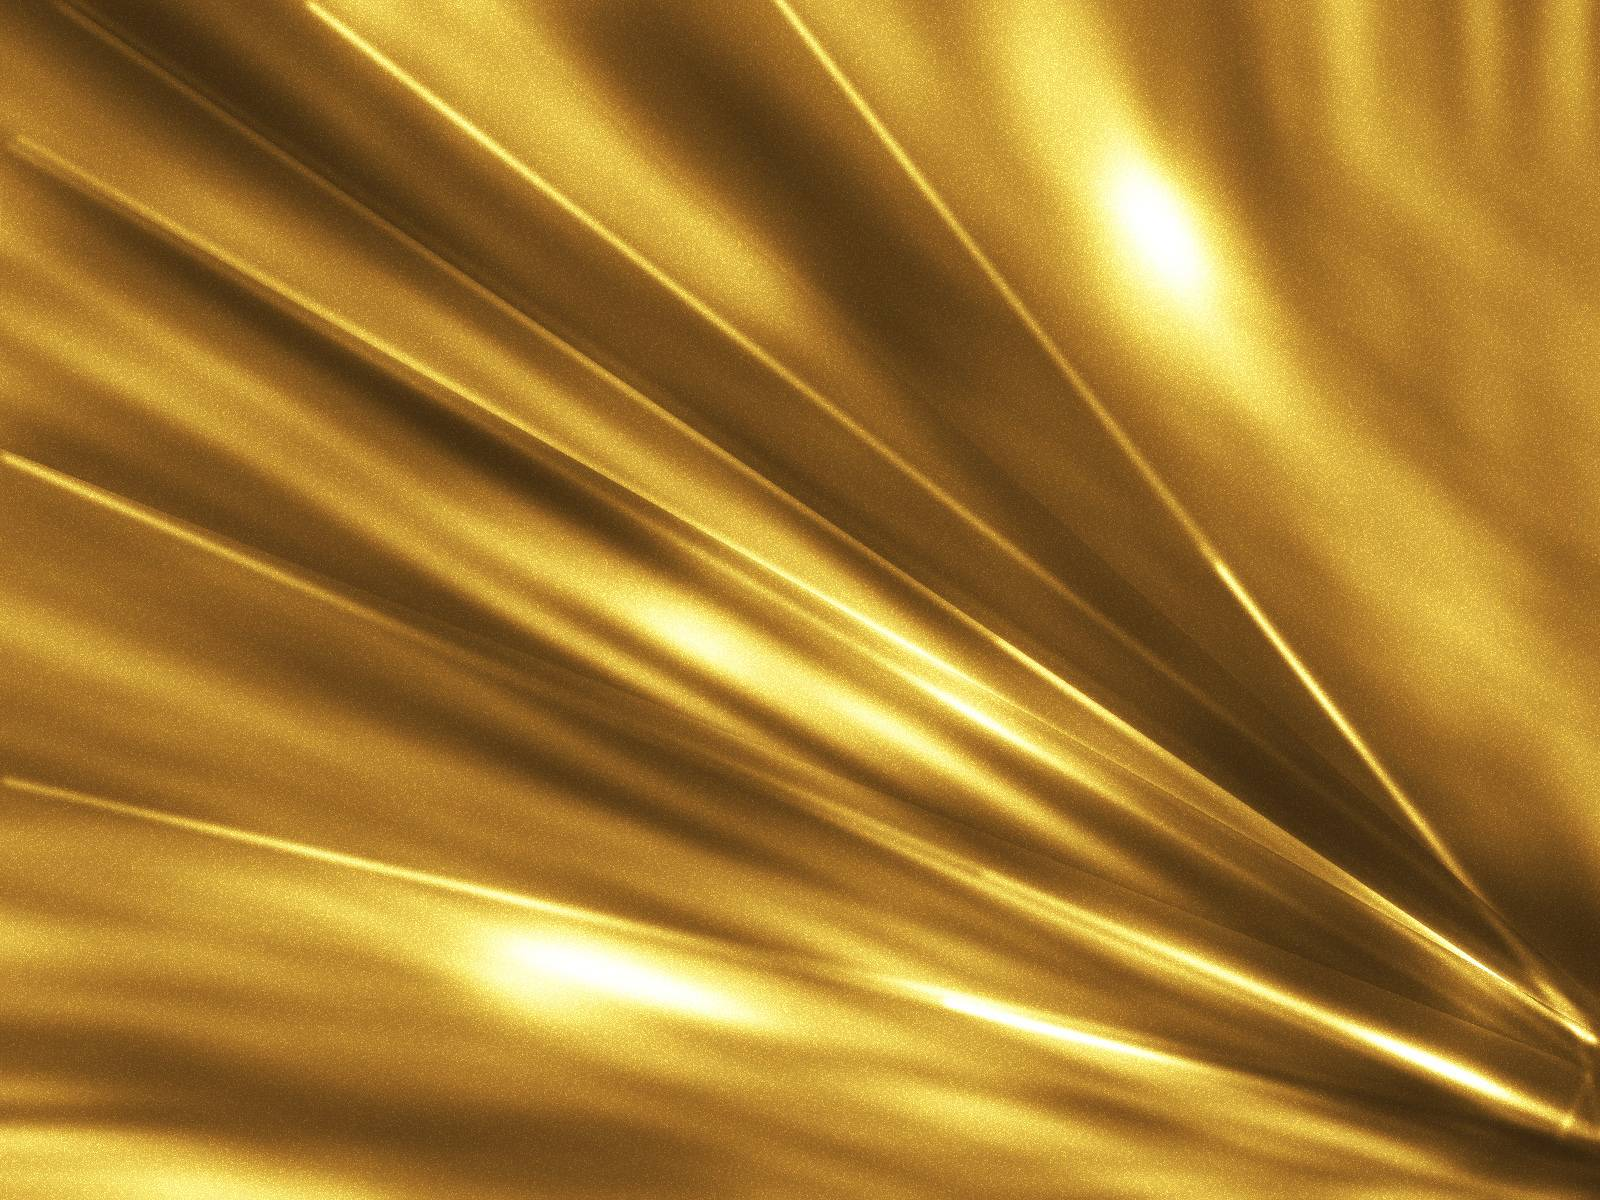 Images Wallpaper » Gold Wallpaper